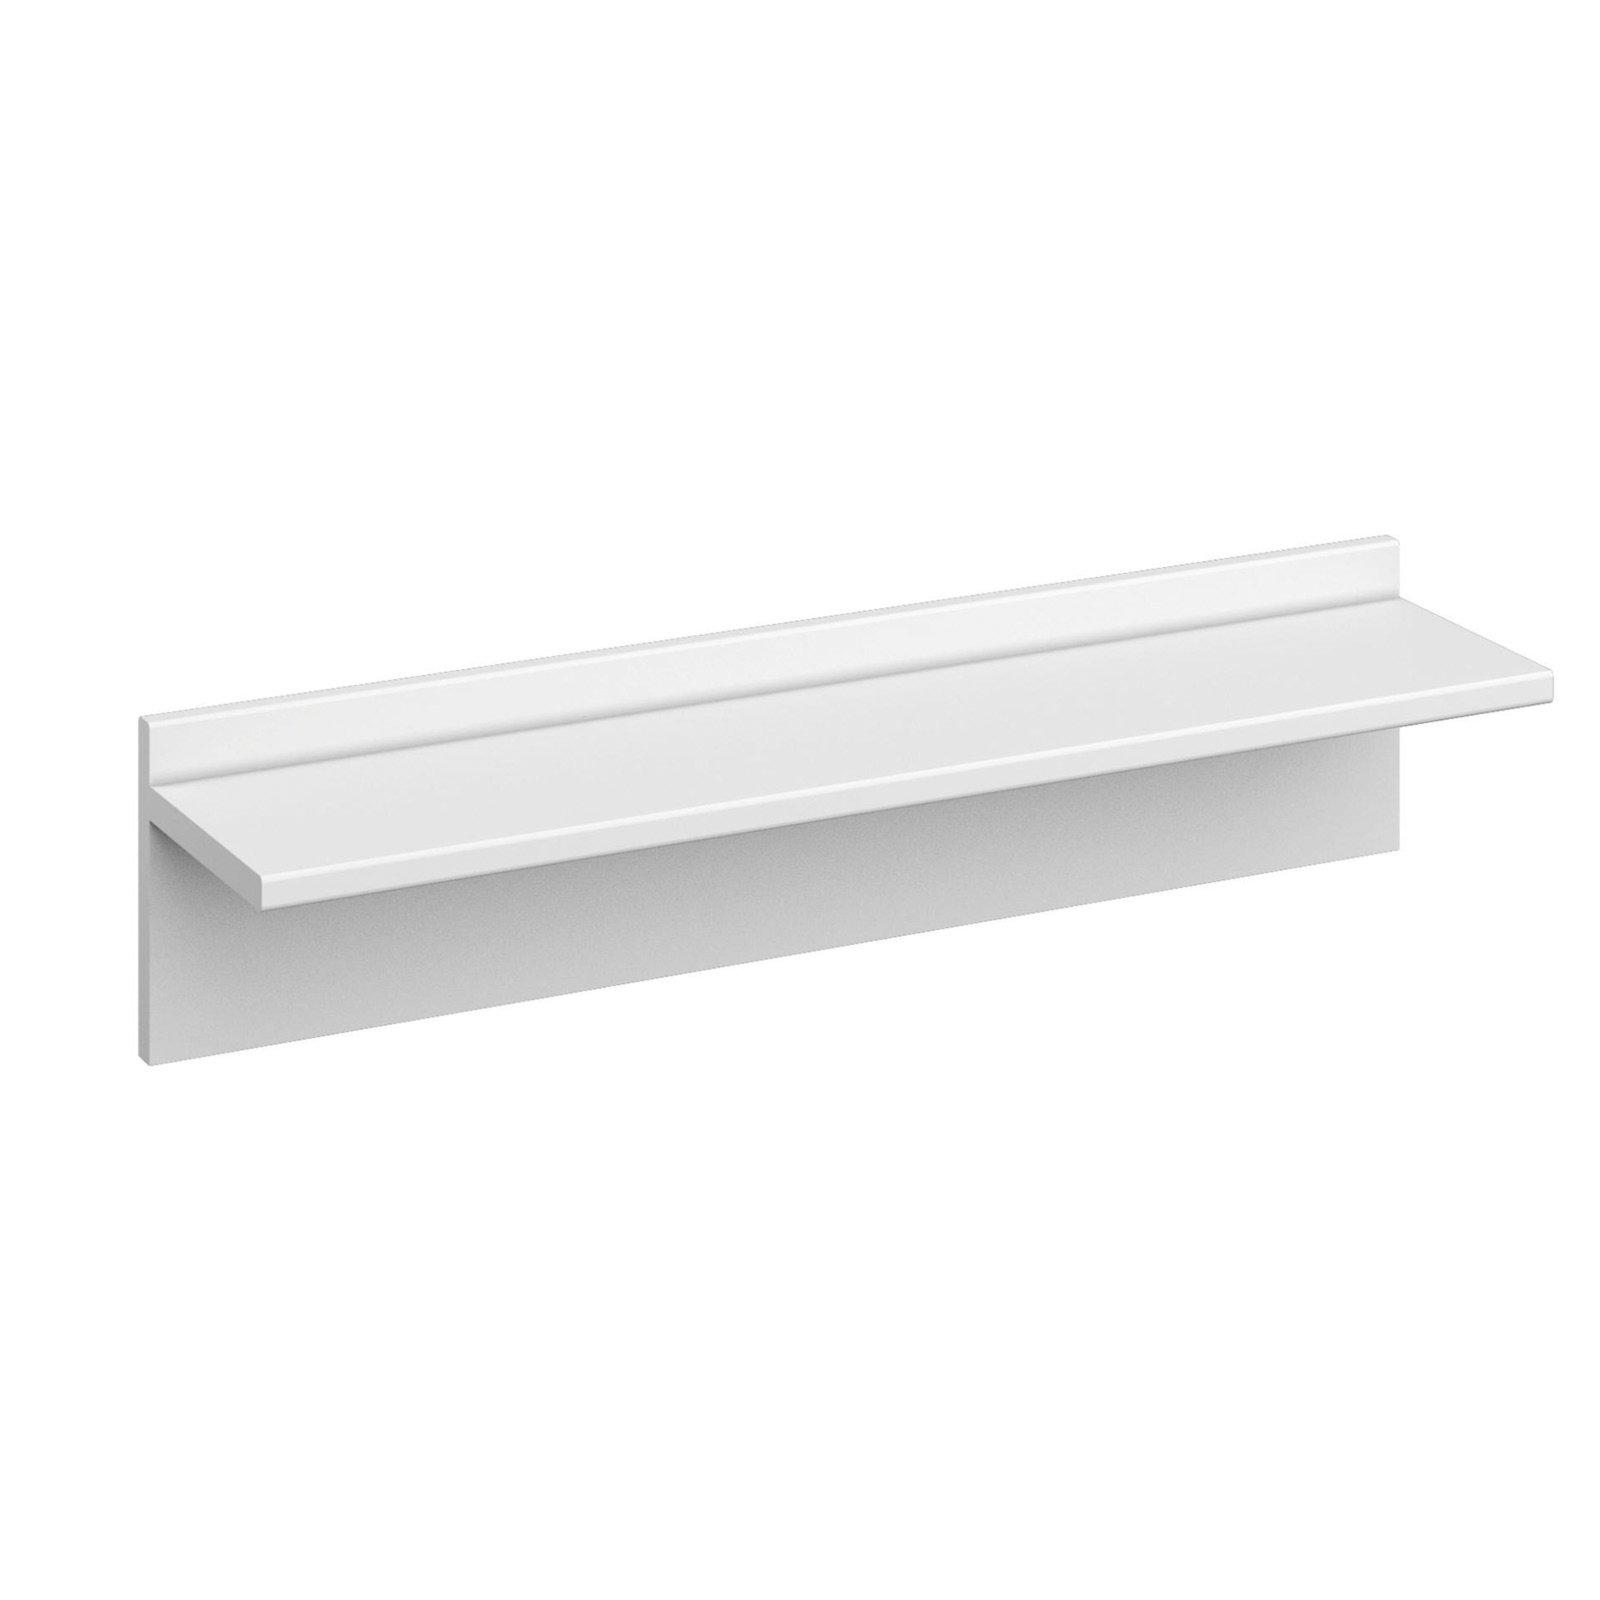 wandboard manja wei 92 cm breit jugendzimmer manja. Black Bedroom Furniture Sets. Home Design Ideas